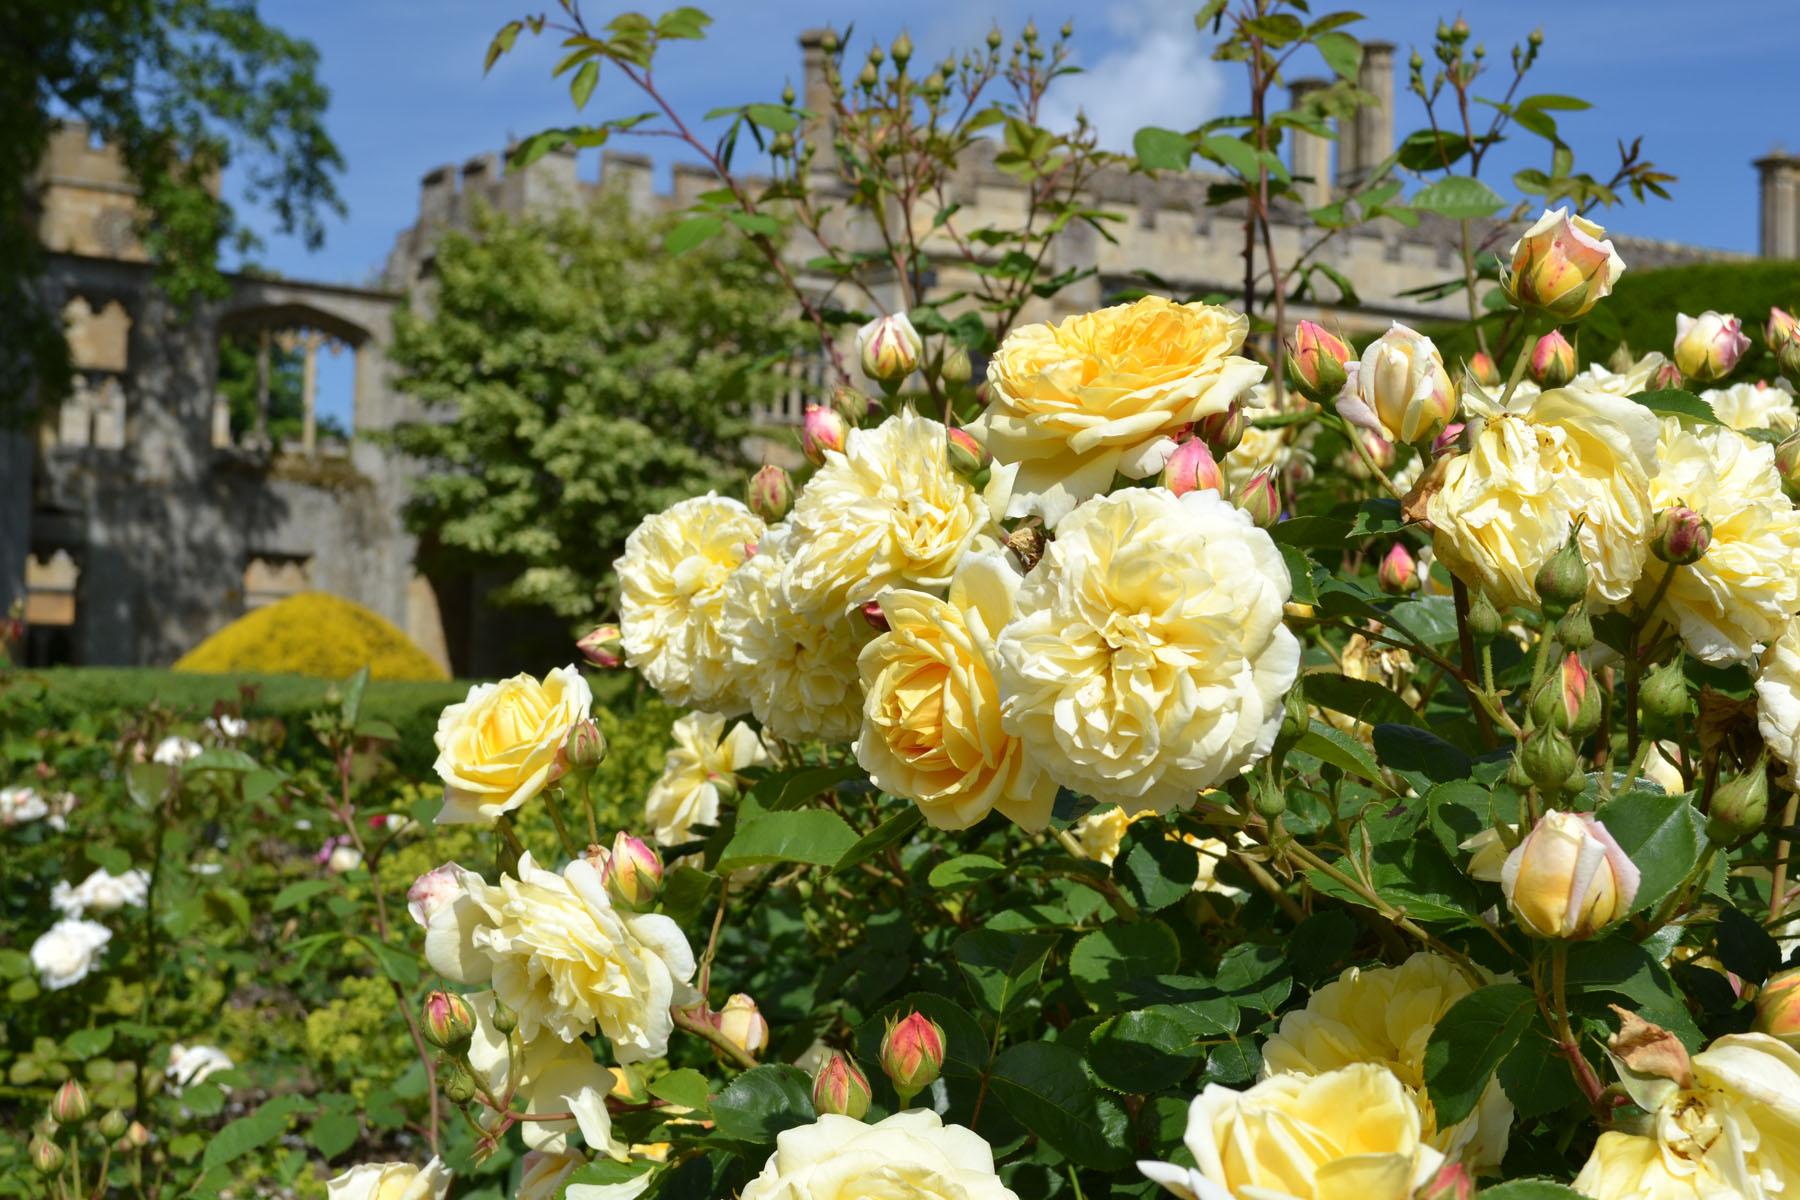 Summer roses at Sudeley Castle